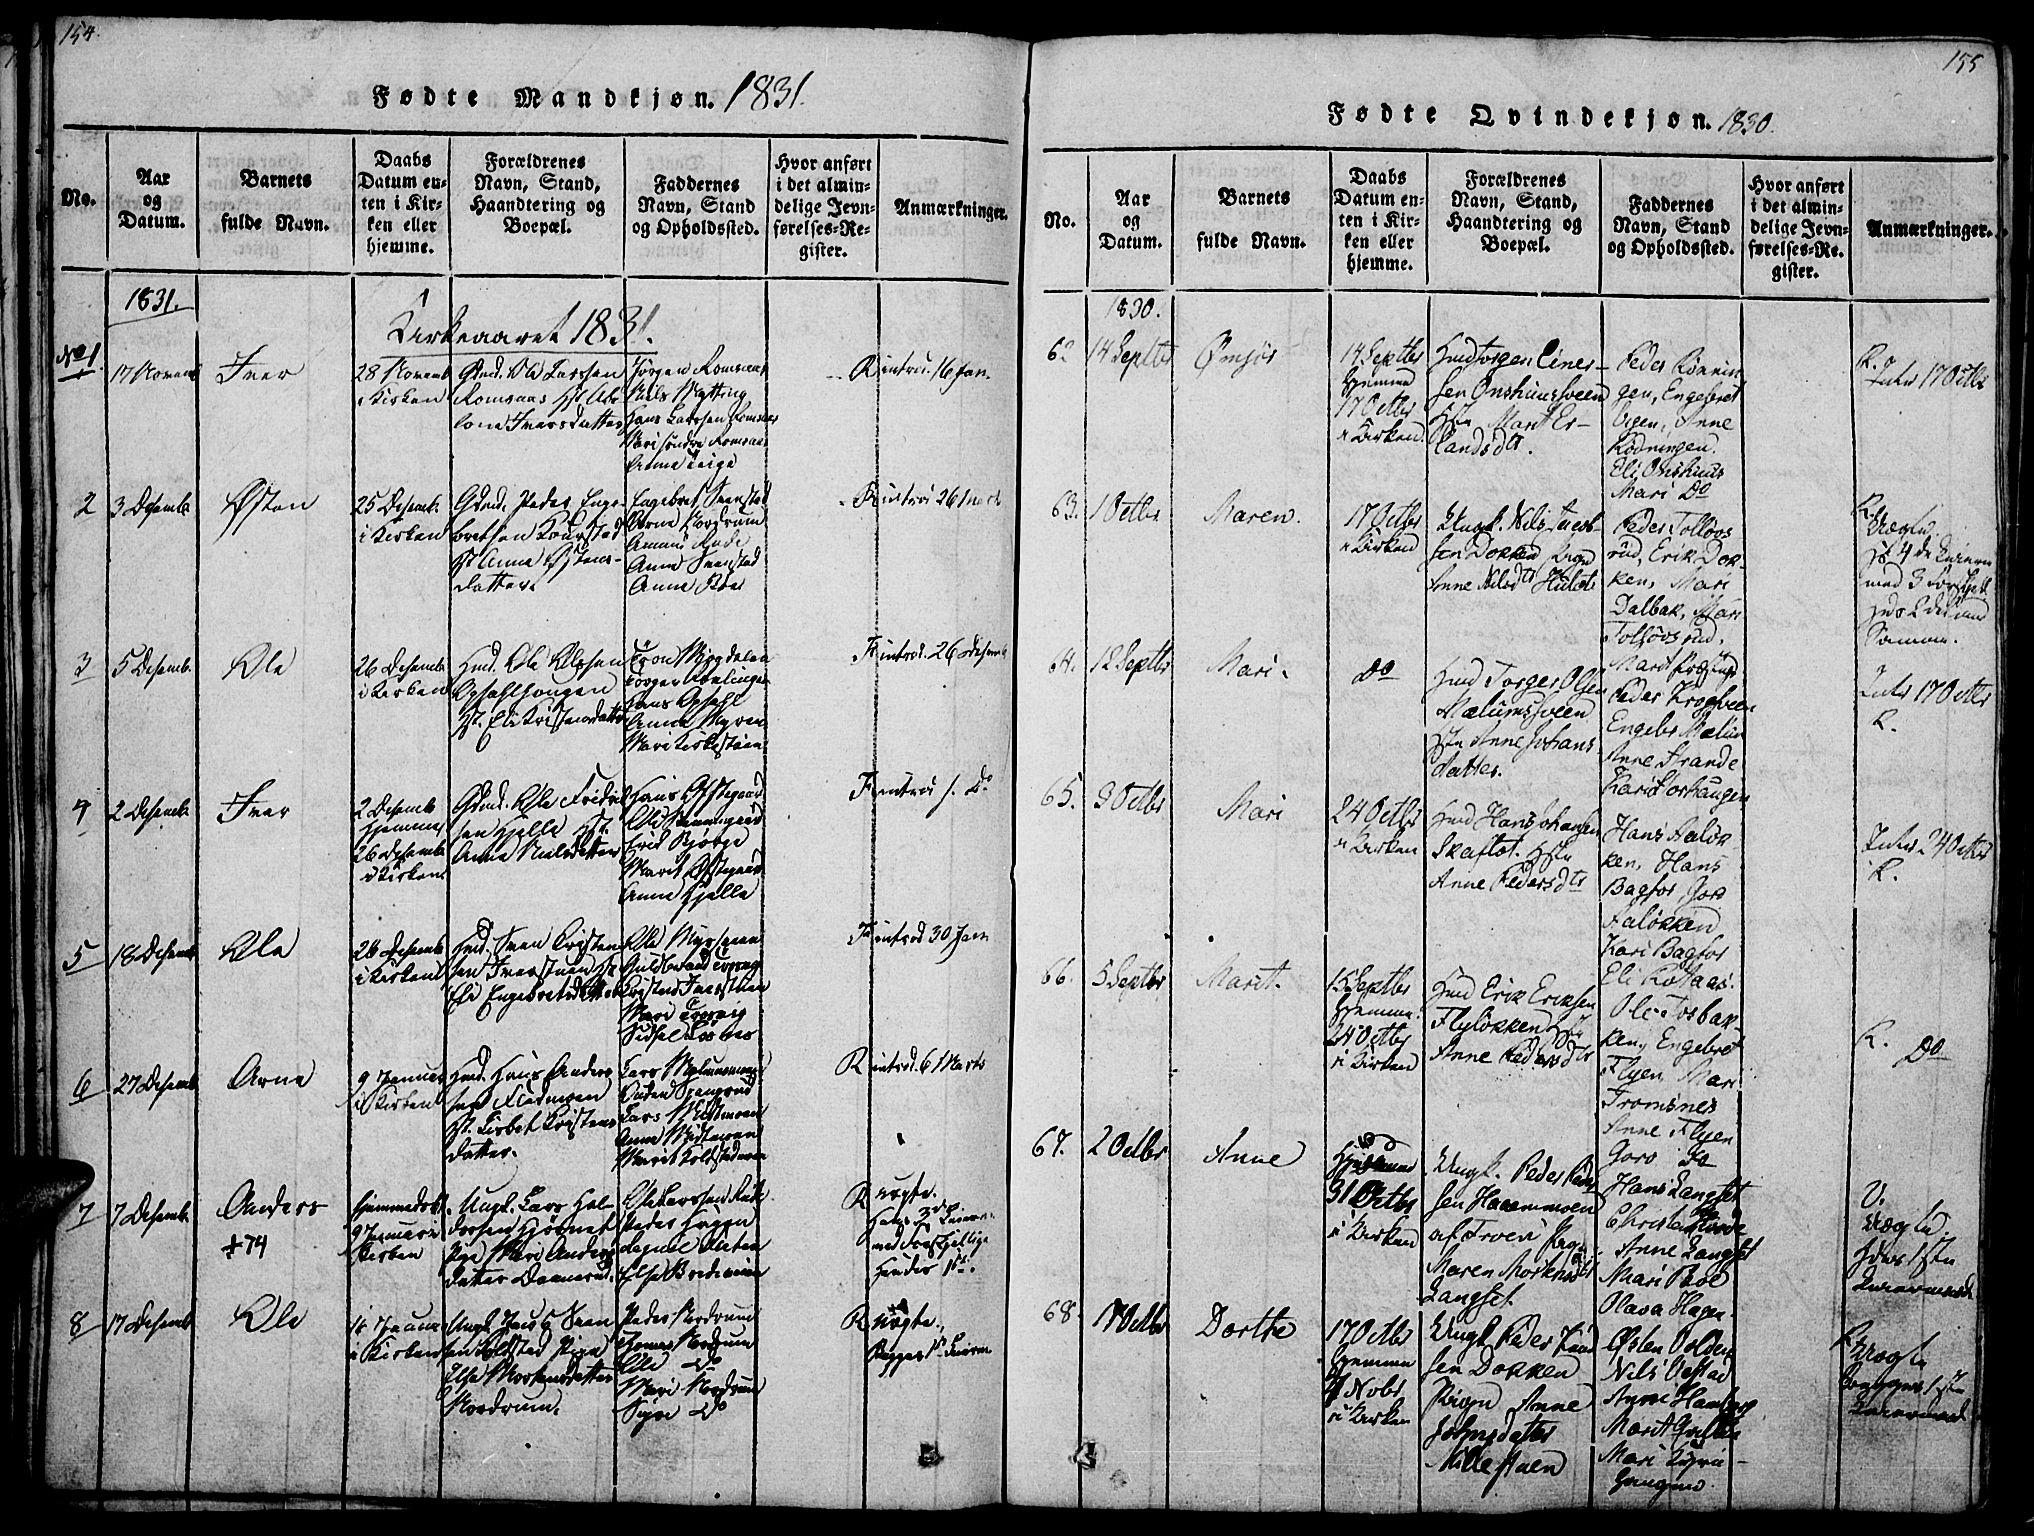 SAH, Ringebu prestekontor, Ministerialbok nr. 4, 1821-1839, s. 154-155